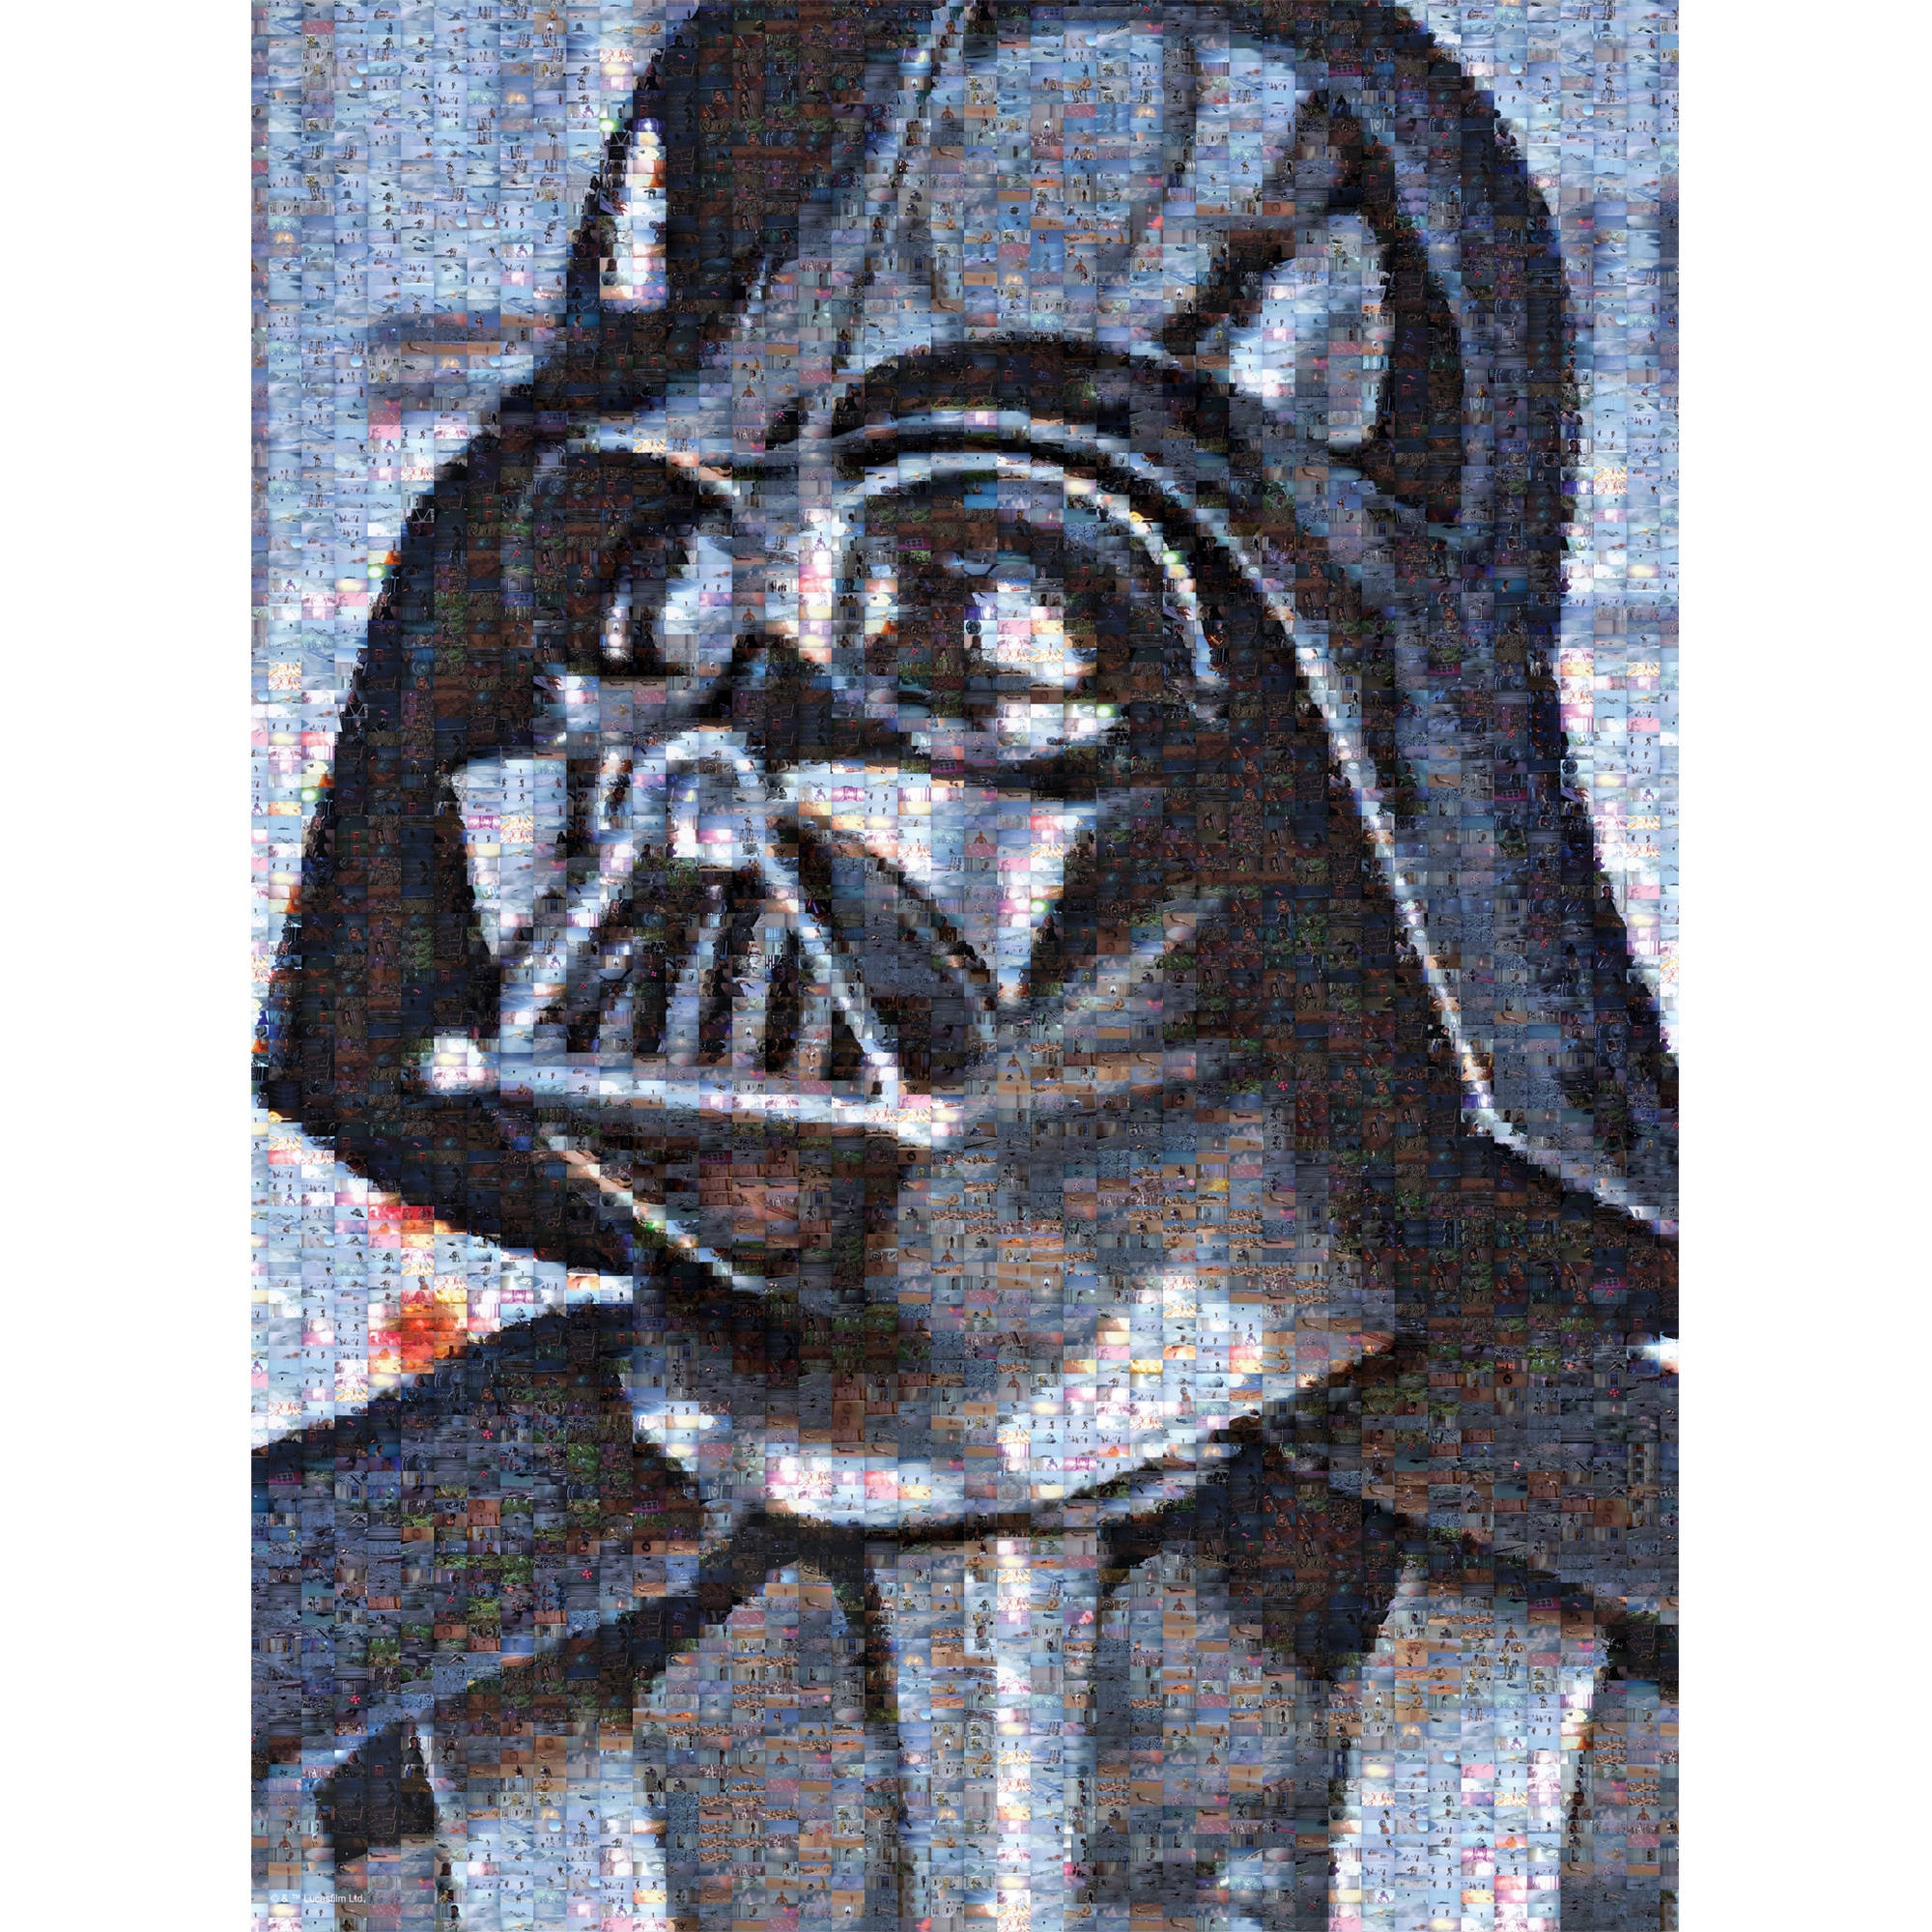 Buffalo Games Star Wars Darth Vader Jigsaw Puzzle, 1,000 Pieces